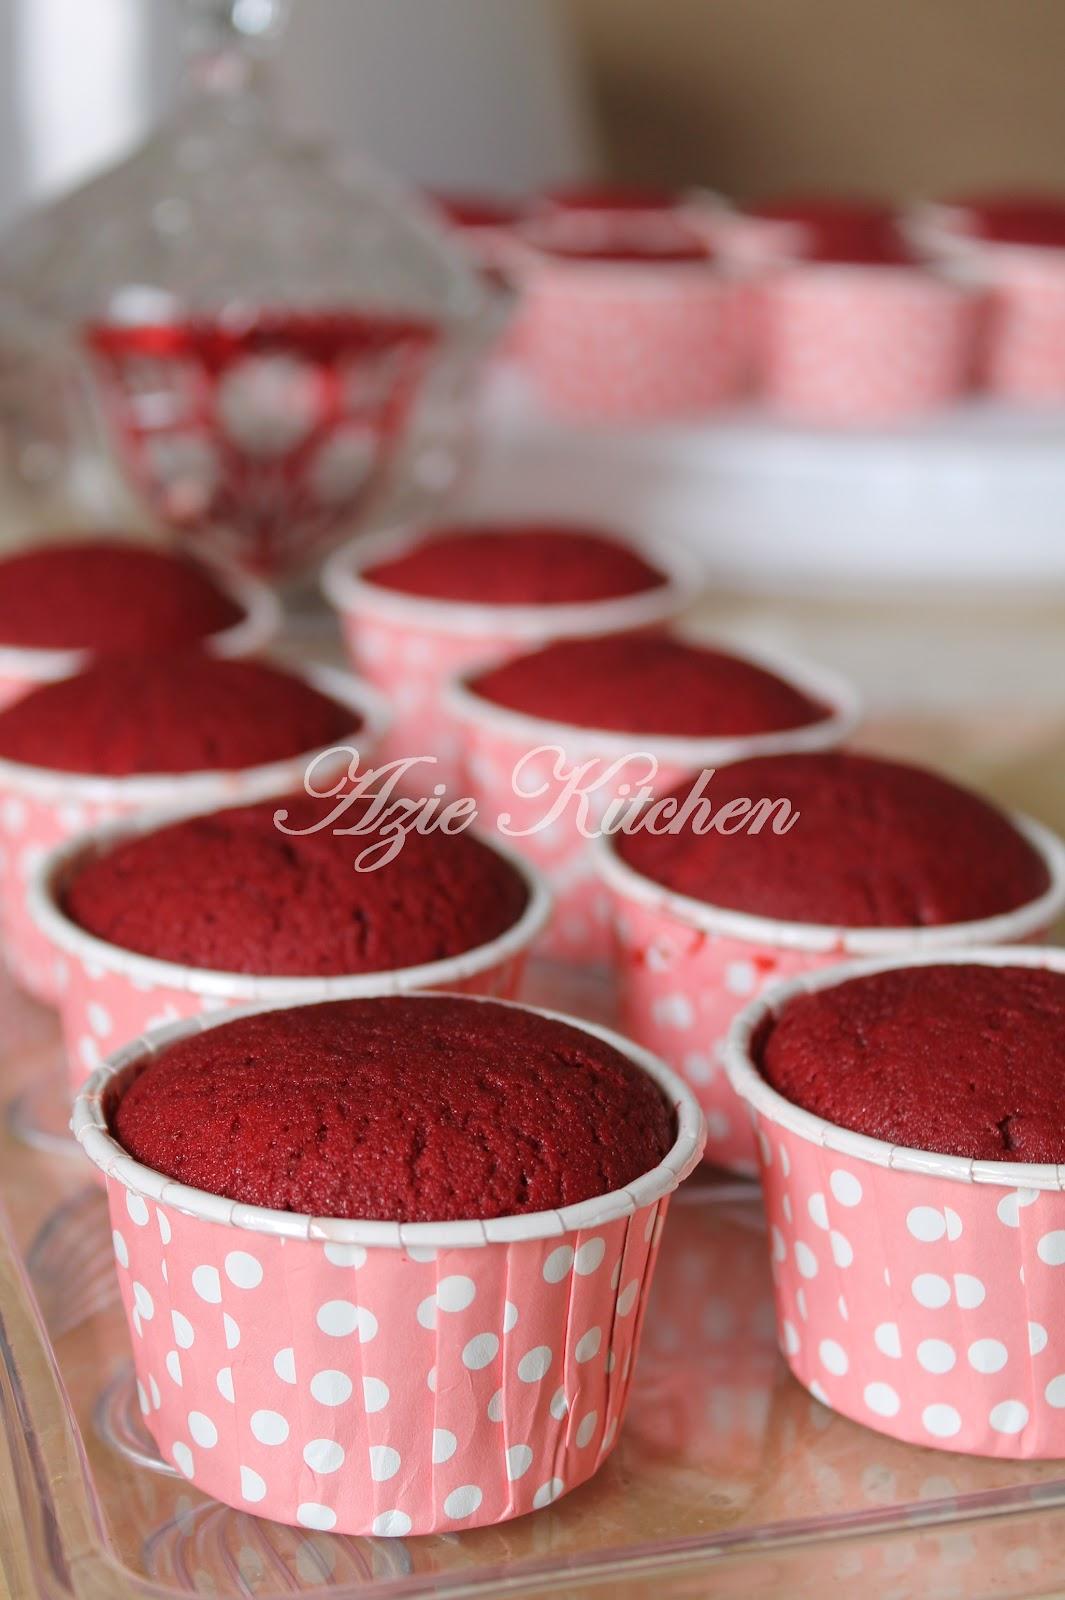 Resepi Cupcake Azie Kitchen Copd Blog R